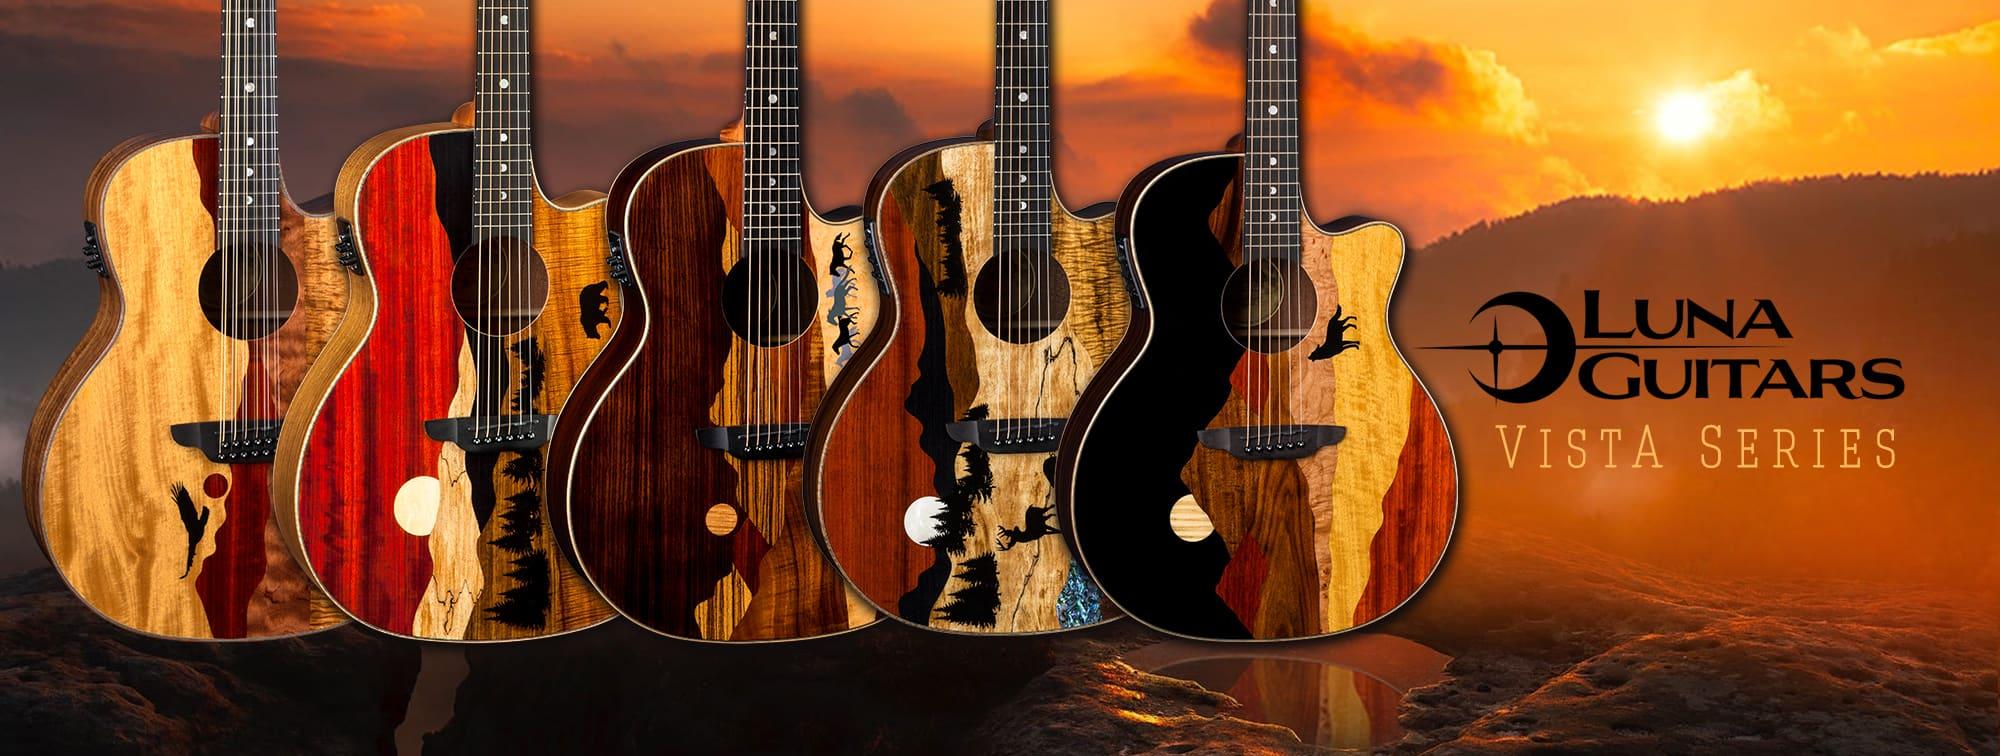 Luna Guitars Free Download Acoustic Electric Guitar Wiring Diagram Previous Next